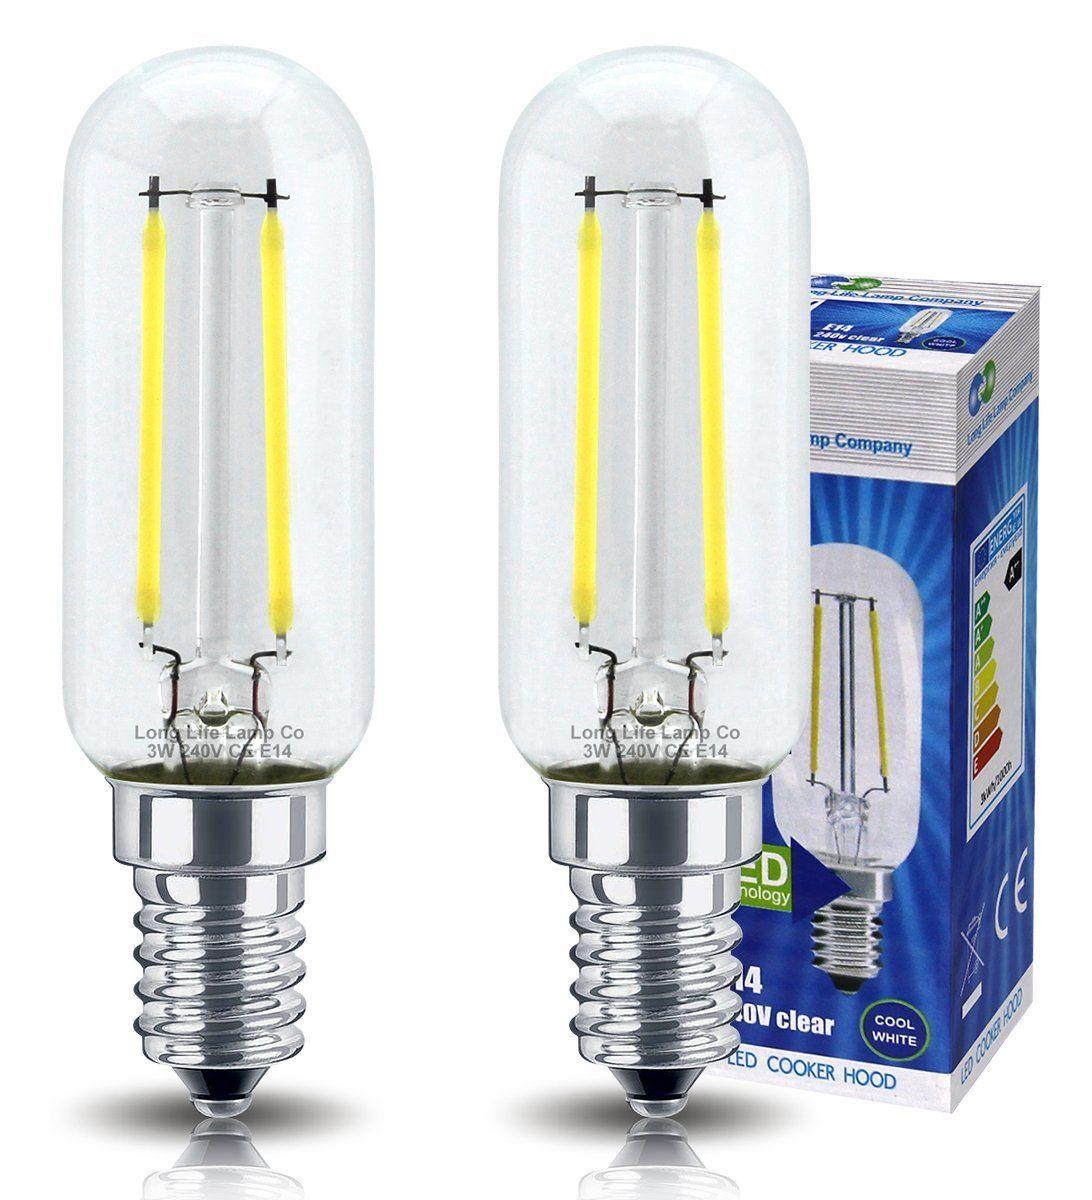 2 Pack Led Cooker Hood Bulb 3w 40w Brightness Energy Saving Ses E14 Small Screw Cooker Hood Bulb Replacement Led Filament Save Energy Bulb Cooker Hoods